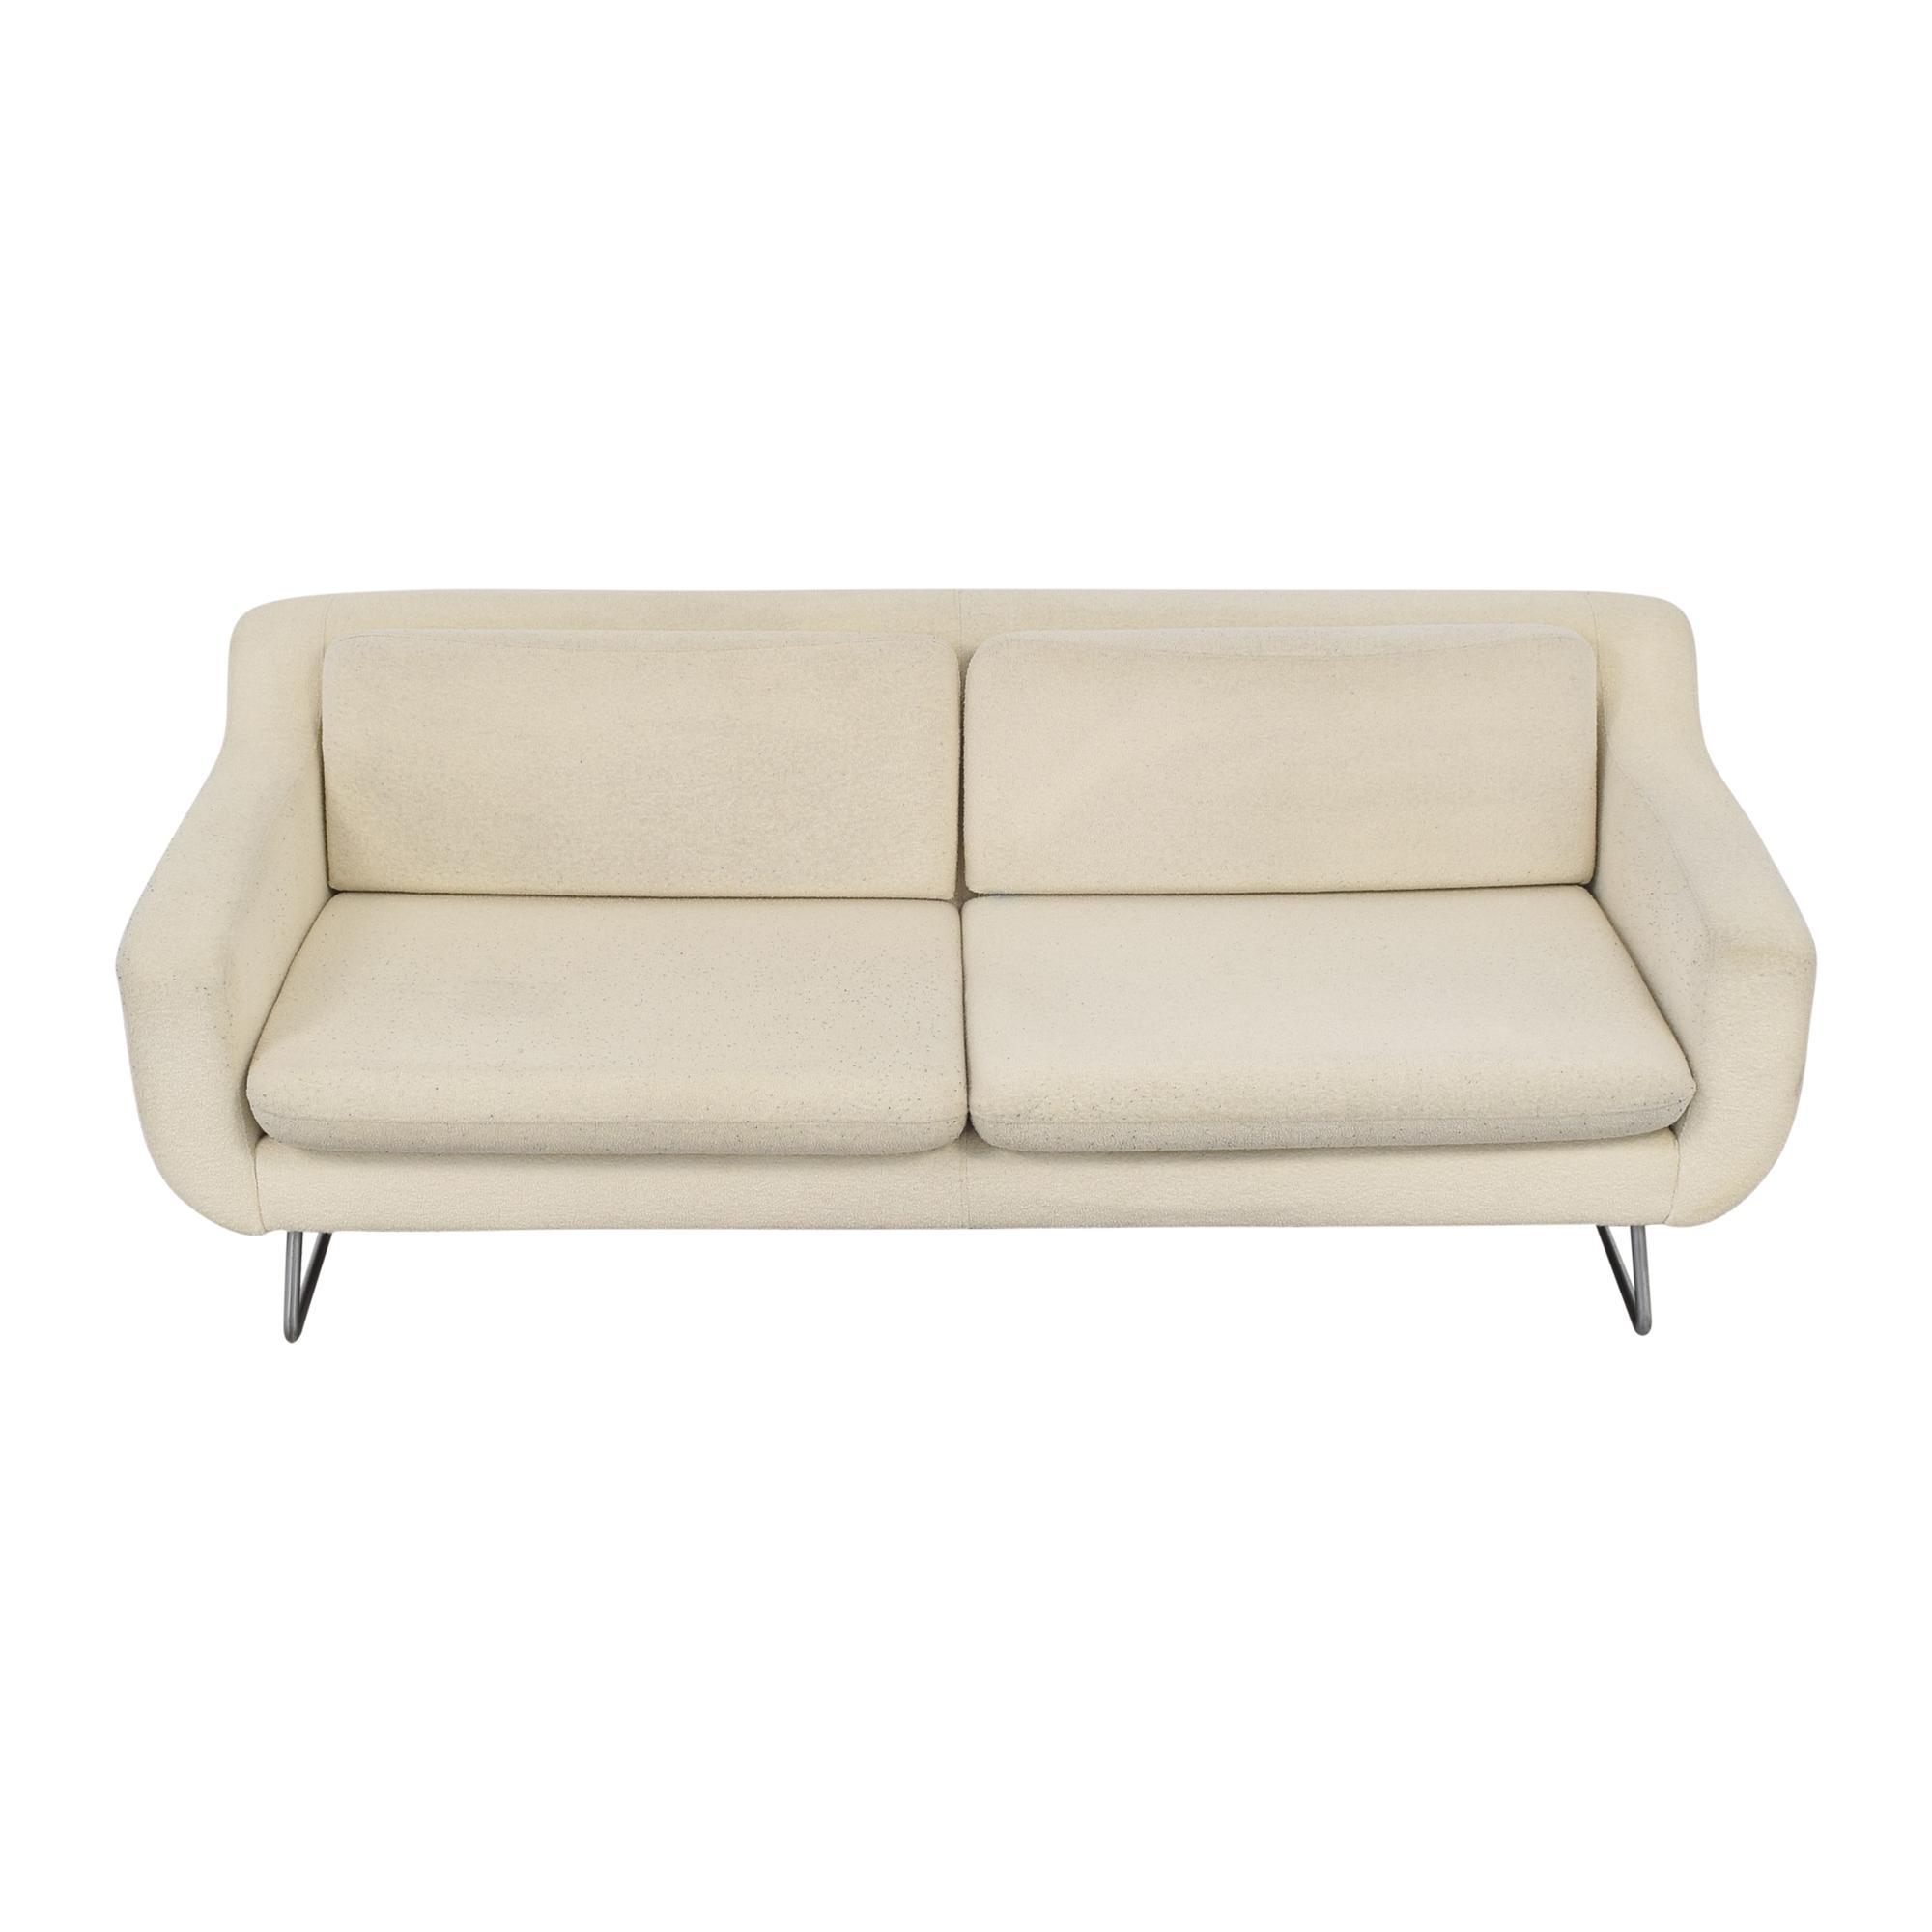 buy Content by Conran Aspen Two Cushion Sofa The Conran Shop Sofas